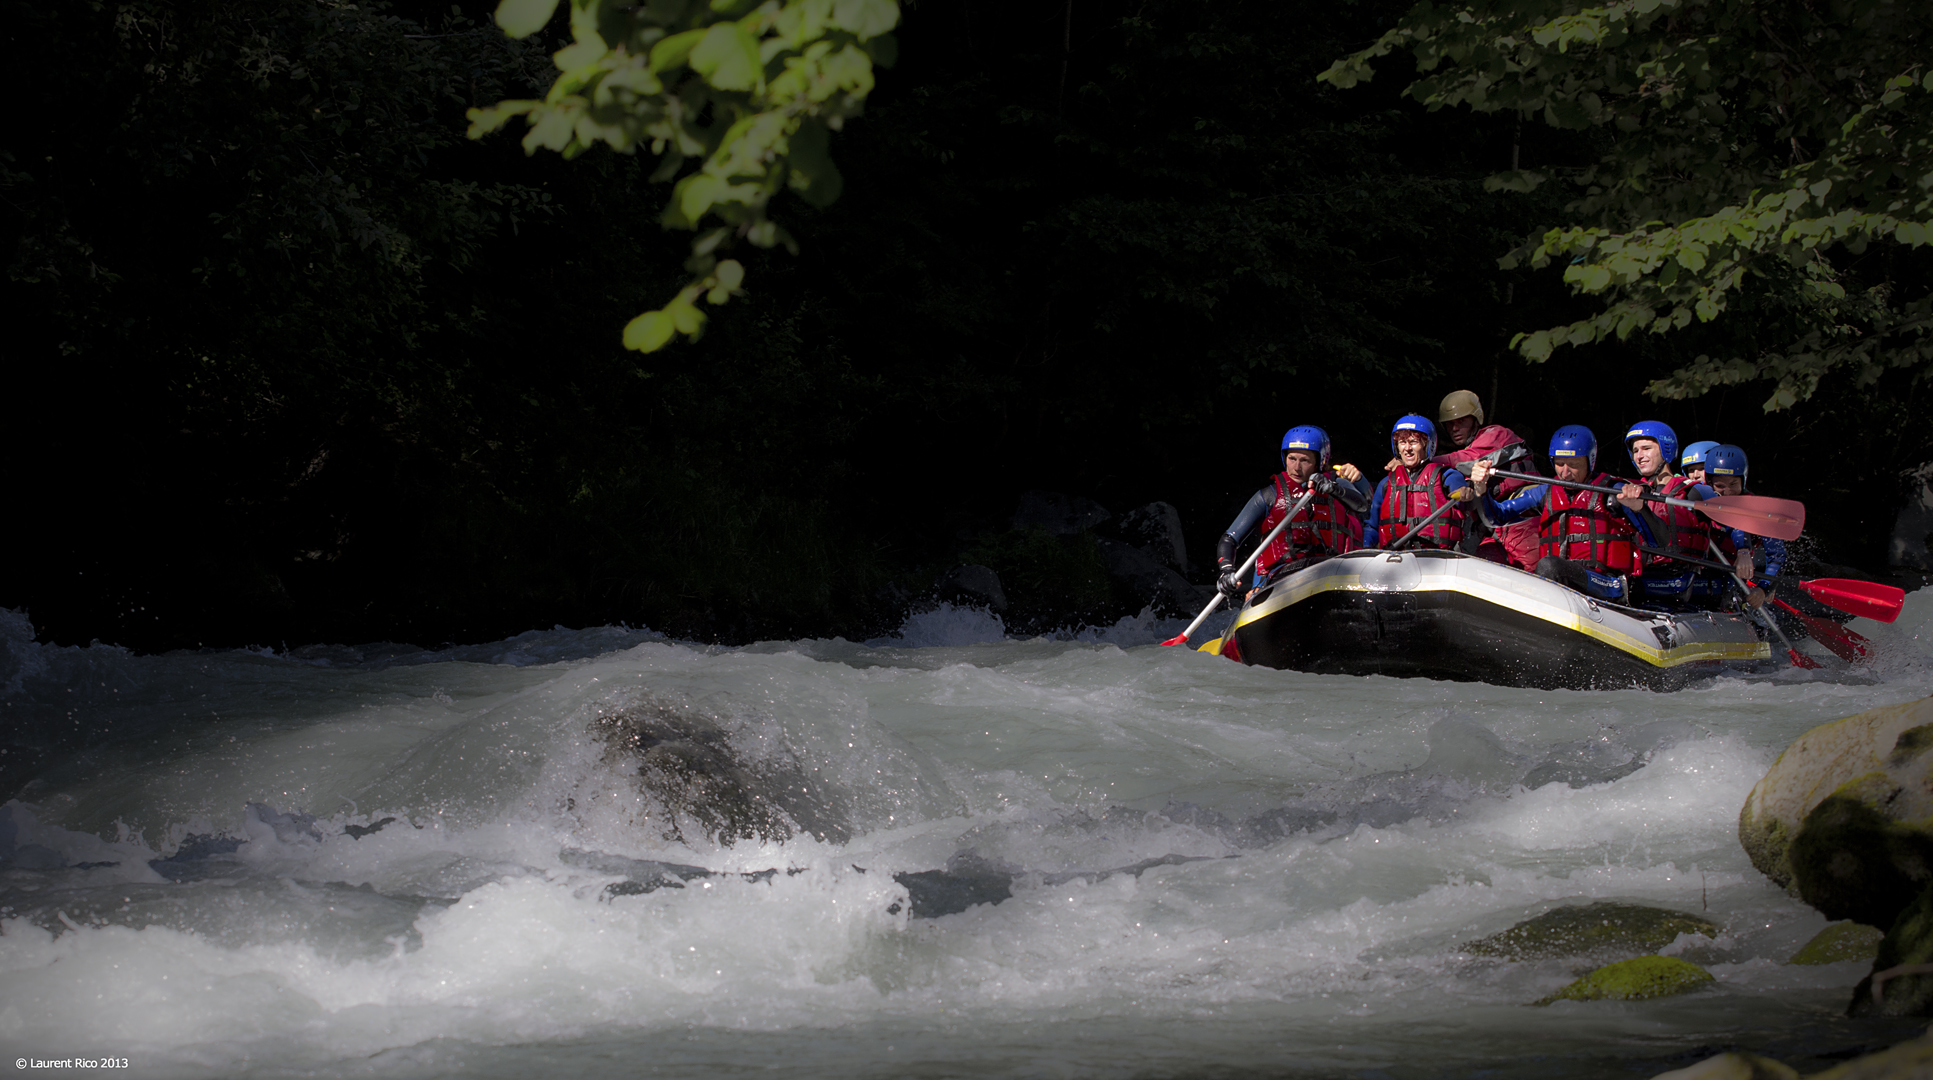 Laurent-rico-savoie-centron-essaonia-photos-videos-reportage-isere-descente-rafting-eau-vive-nage-hot-dog